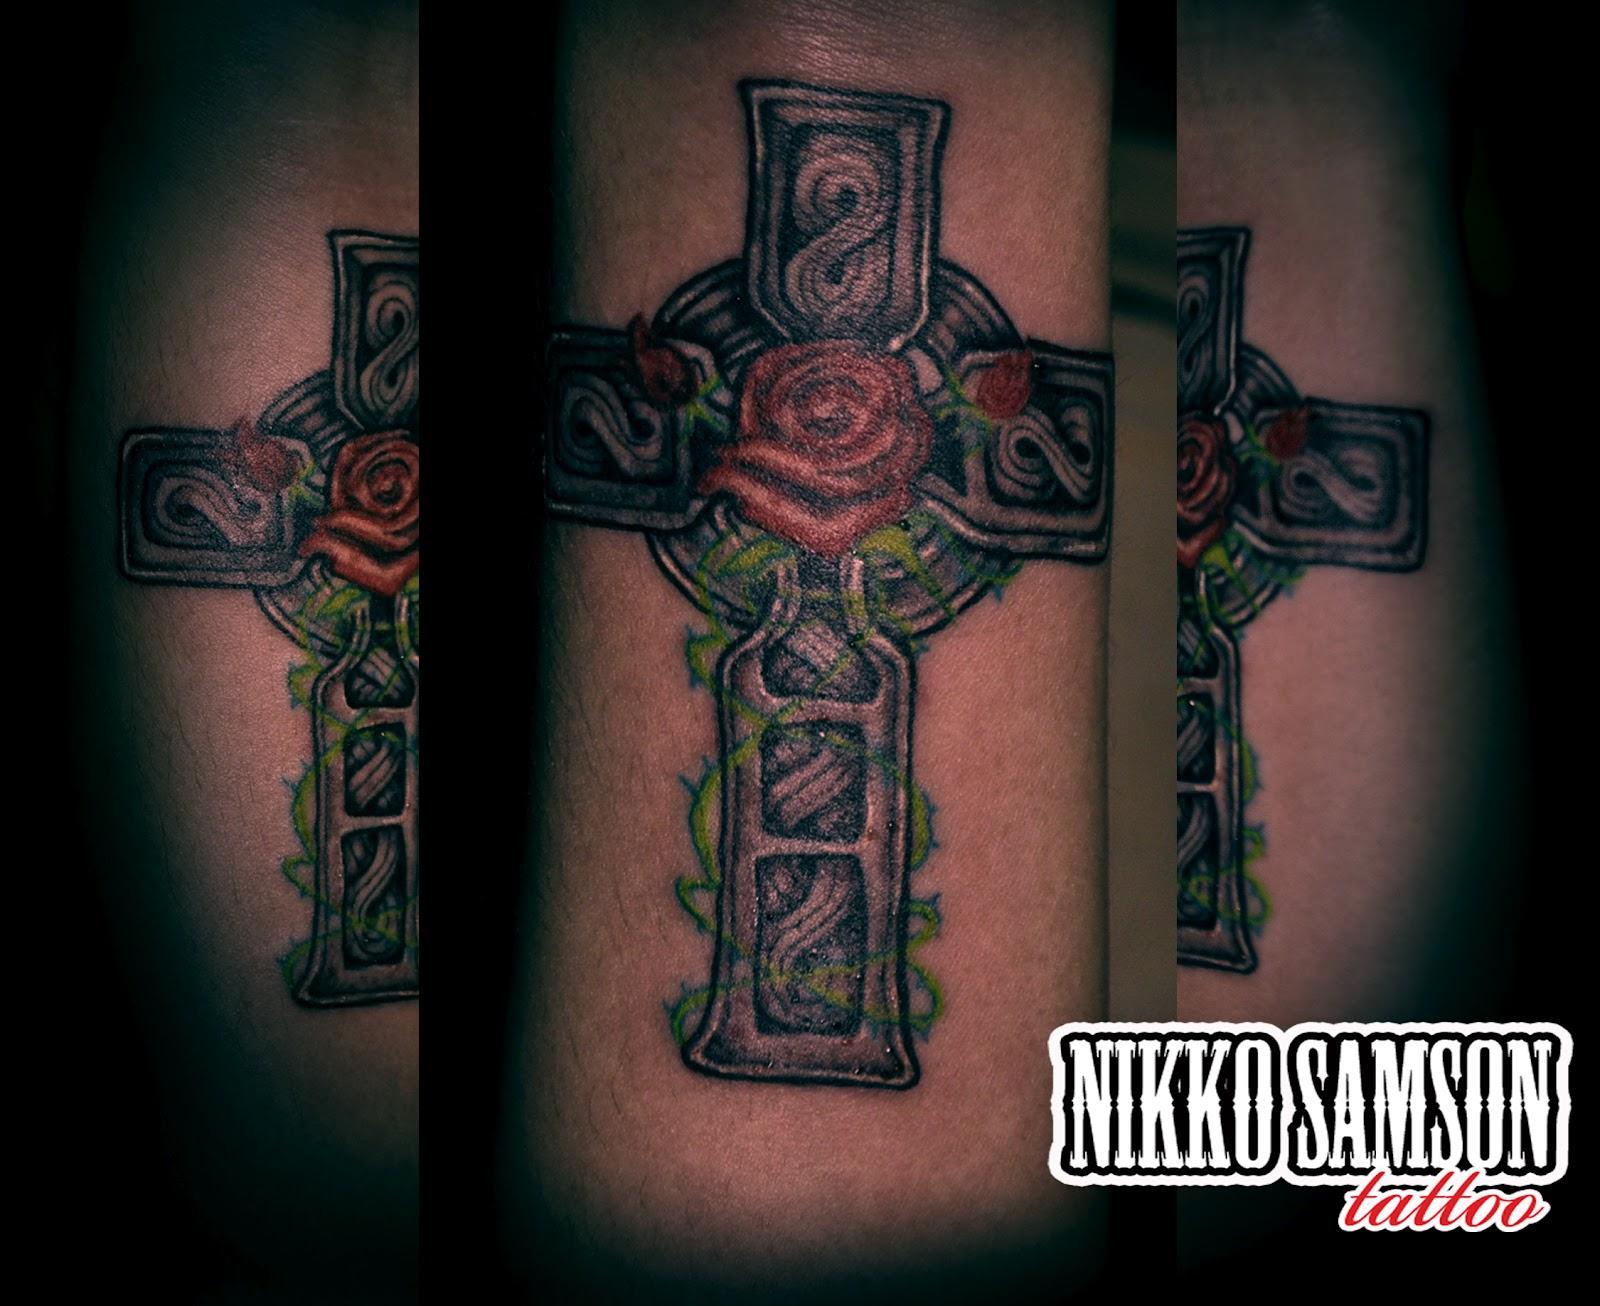 fb56310f6 Nikko Samson Tattoo: Female Tattoos